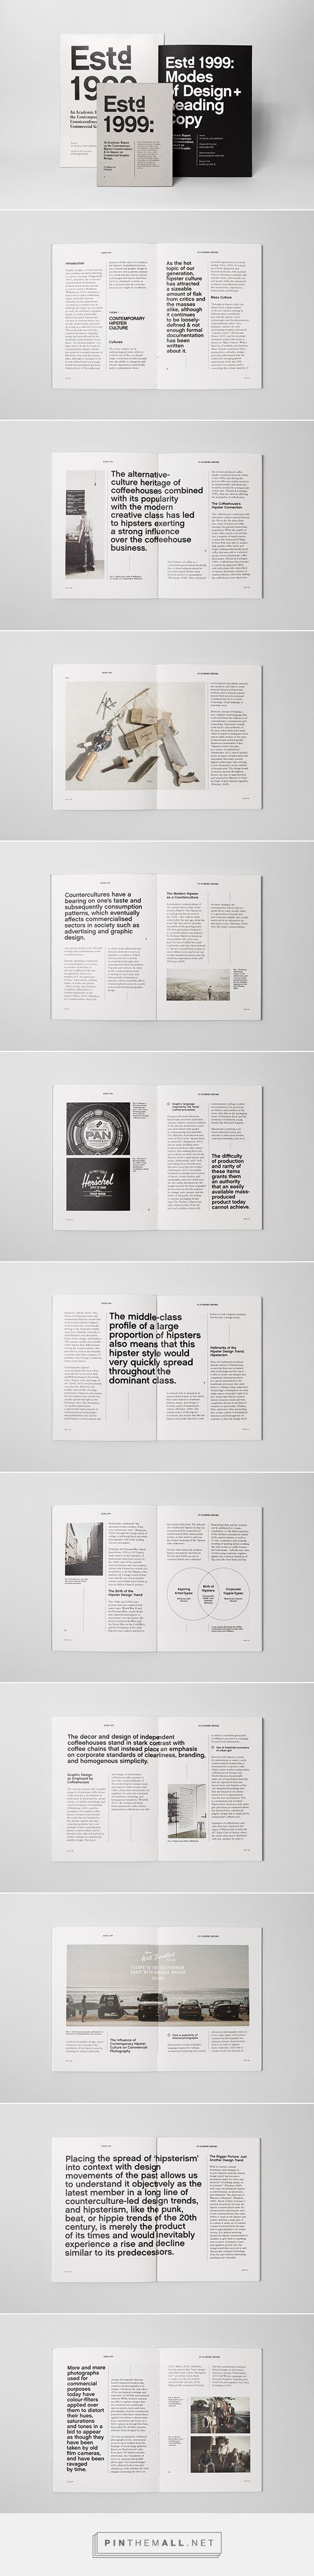 Estd 1999: An Academic Report  https://www.behance.net/gallery/23070193/Estd-1999-An-Academic-Report